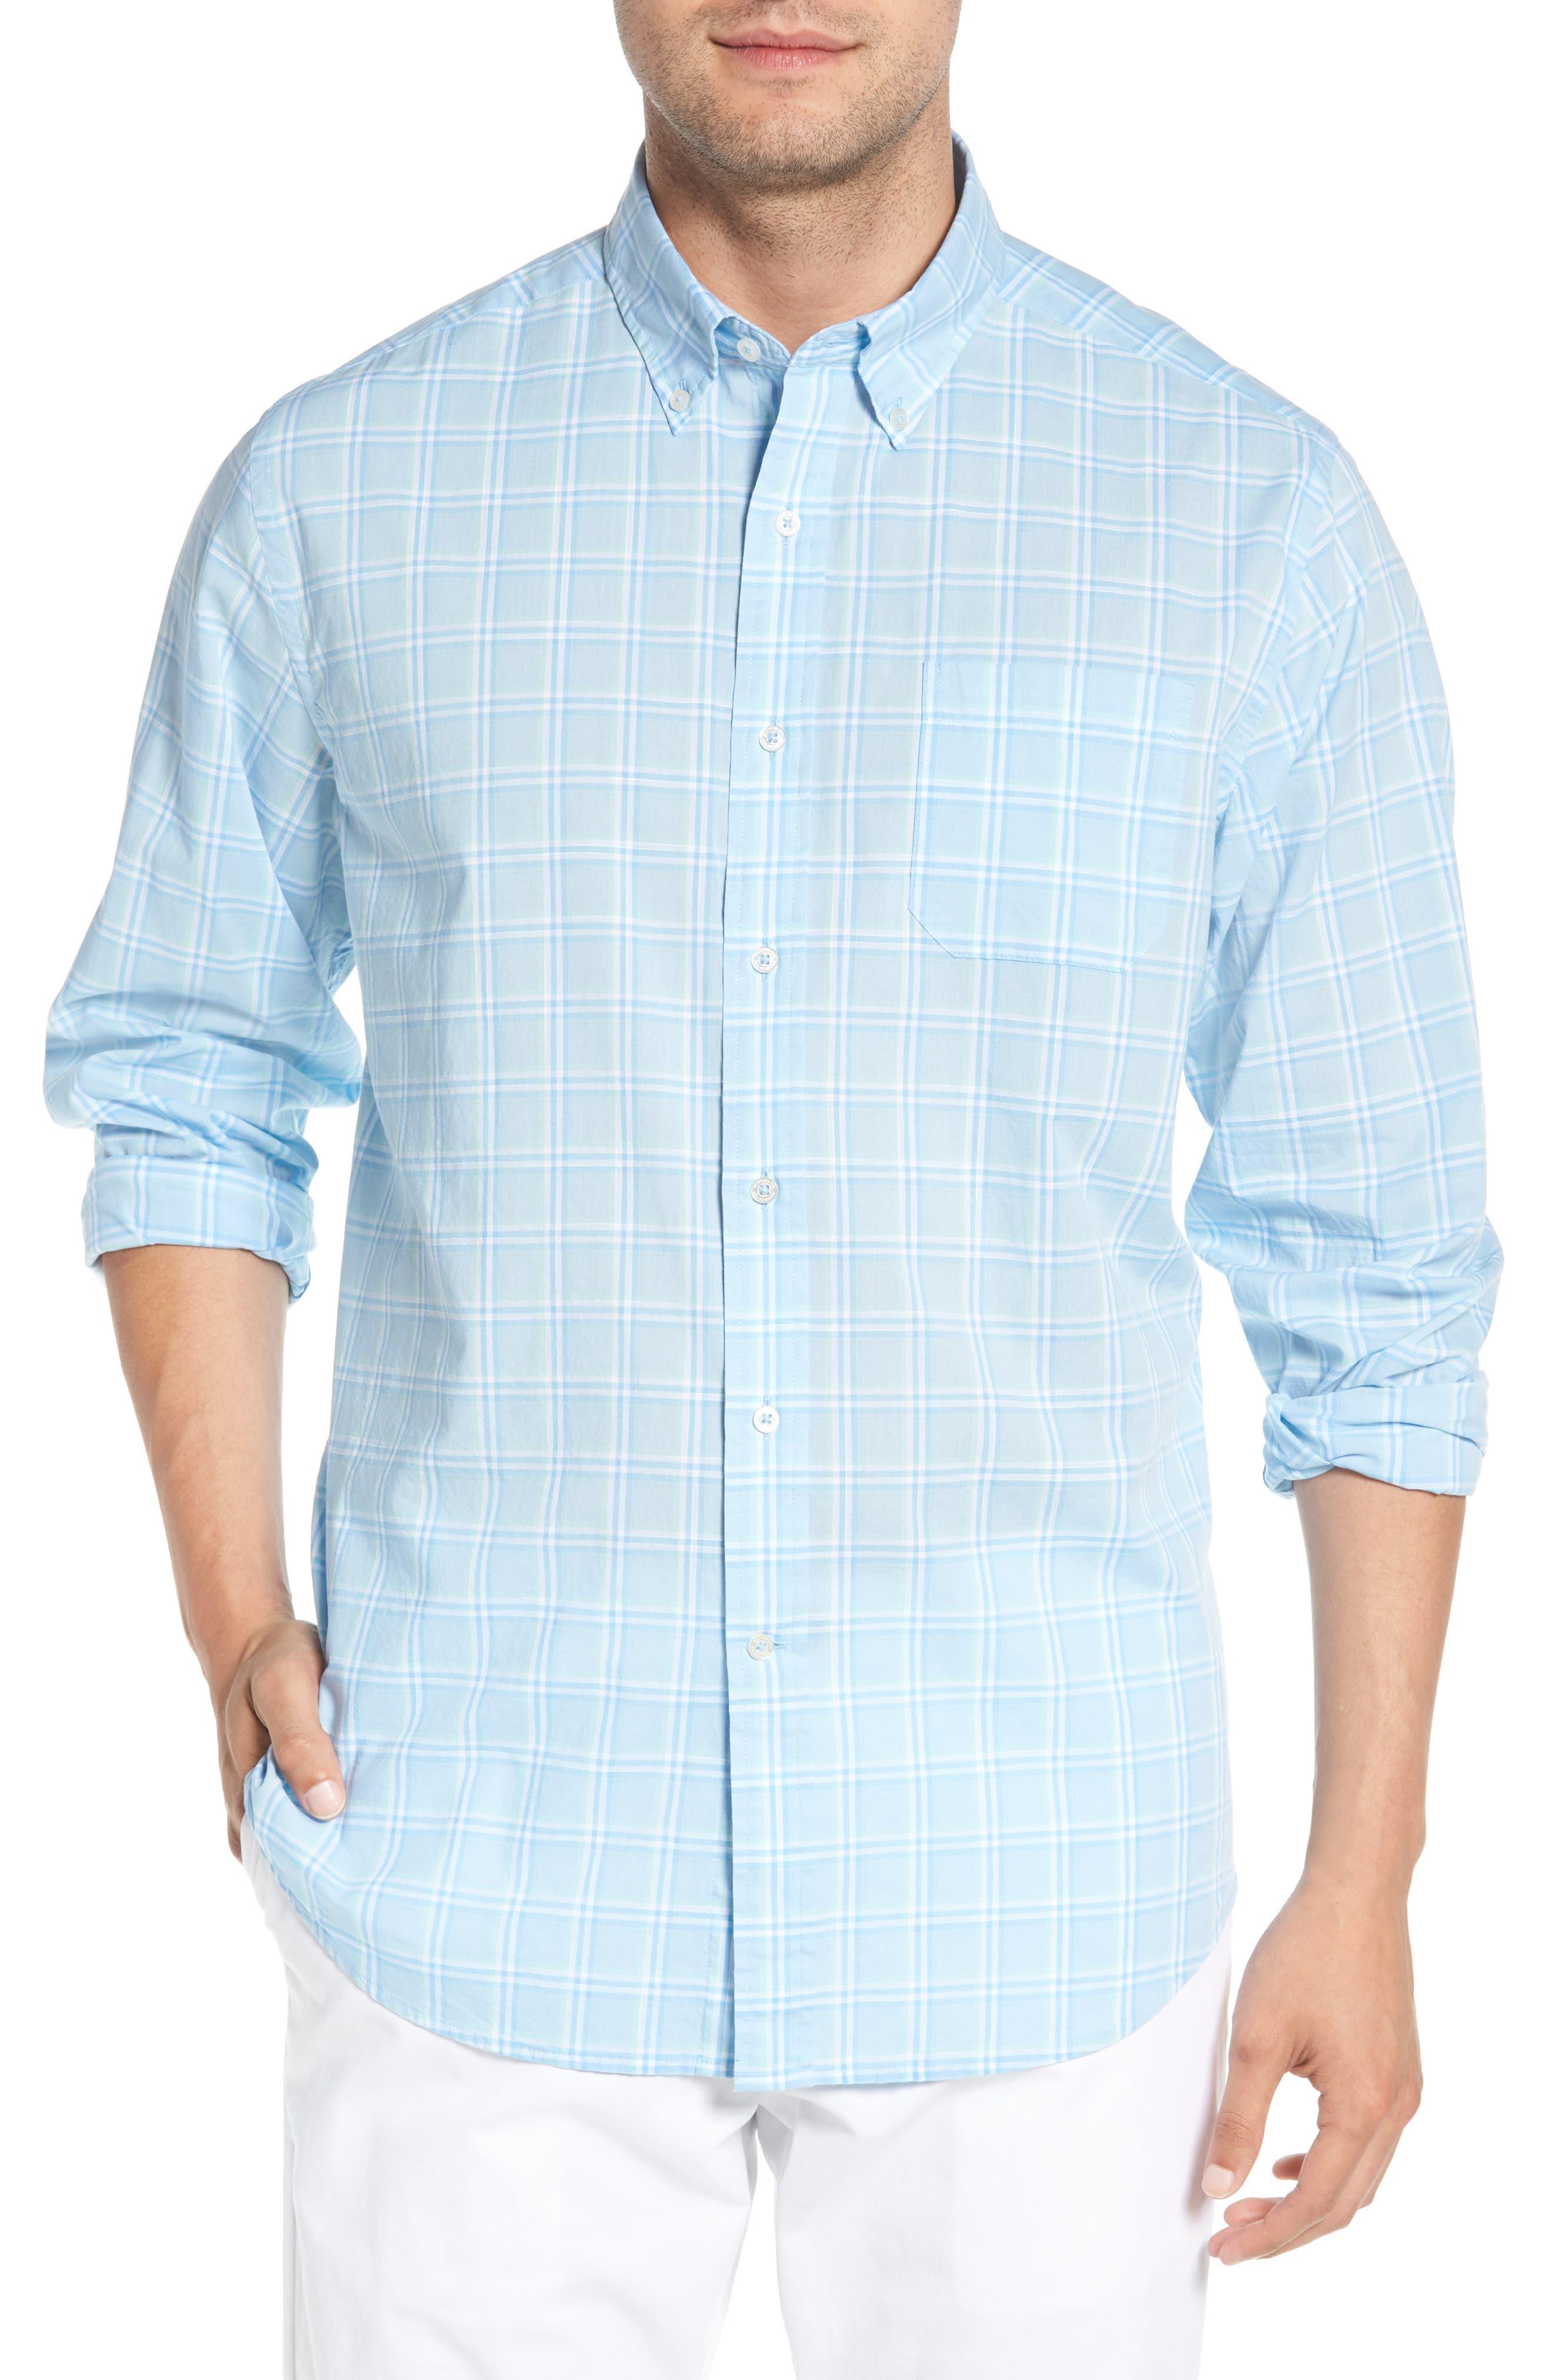 Roadstead Regular Fit Plaid Sport Shirt,                             Main thumbnail 1, color,                             450